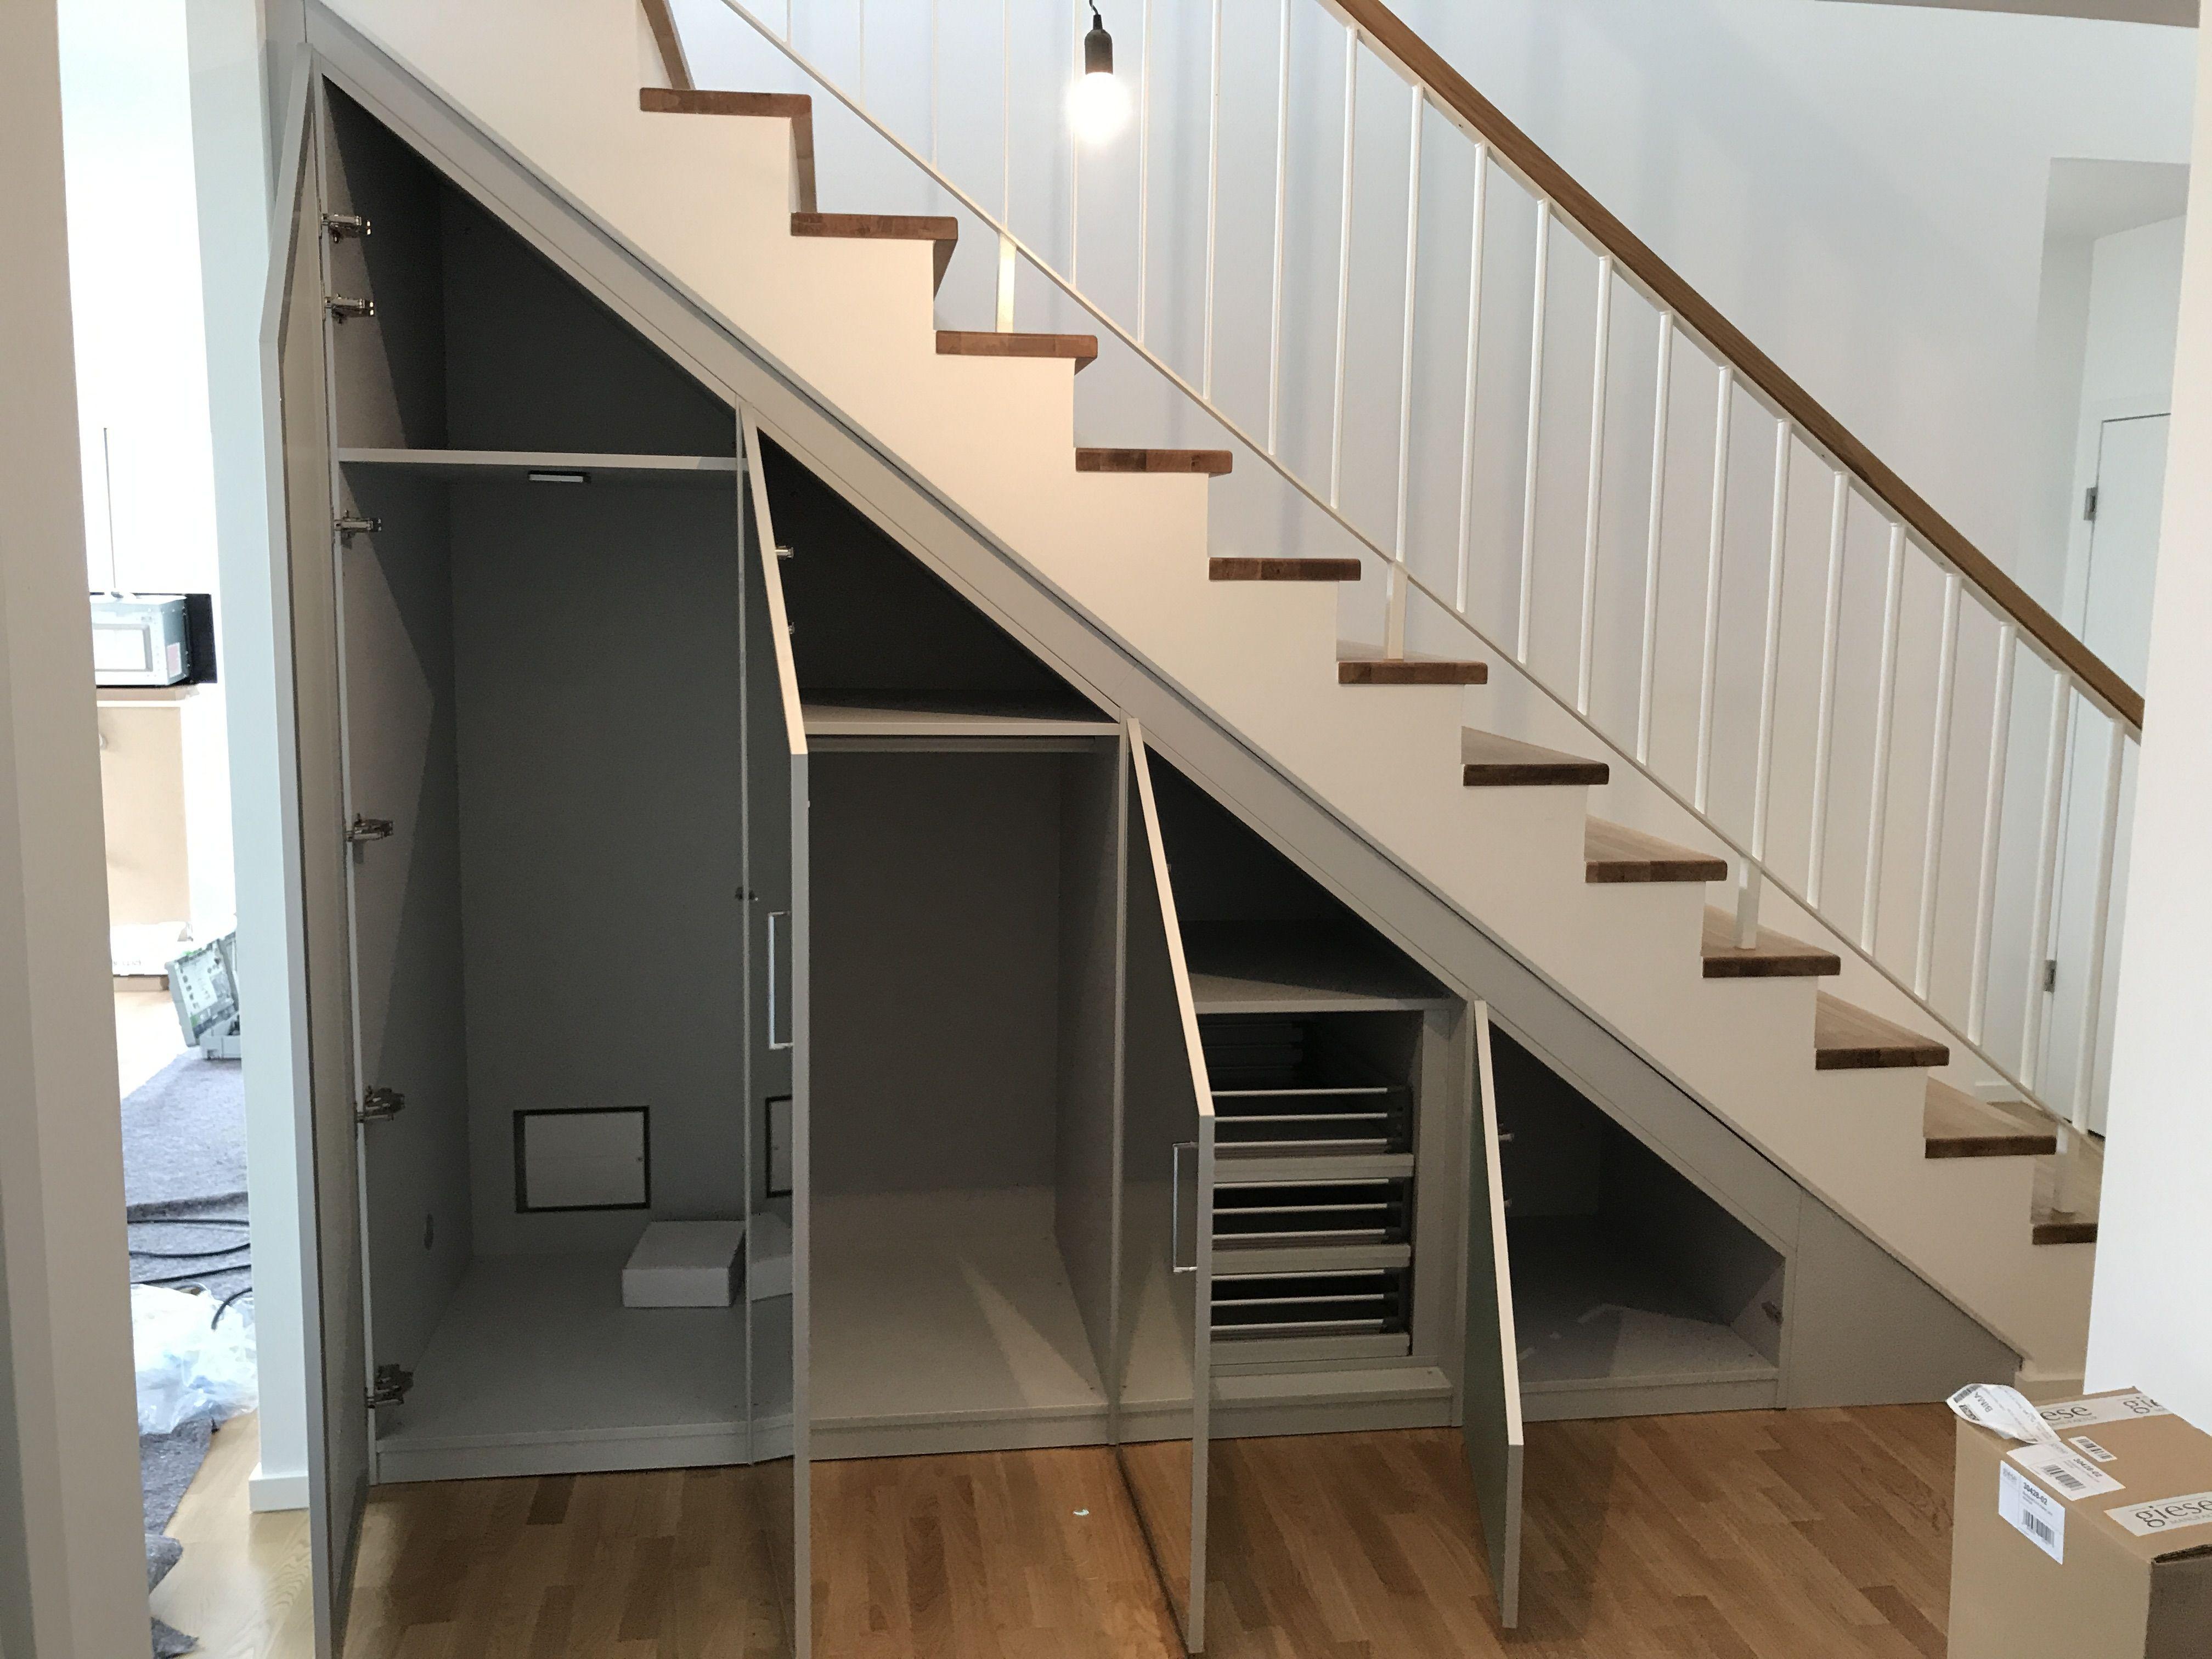 гардеробная под лестницей идеи фото